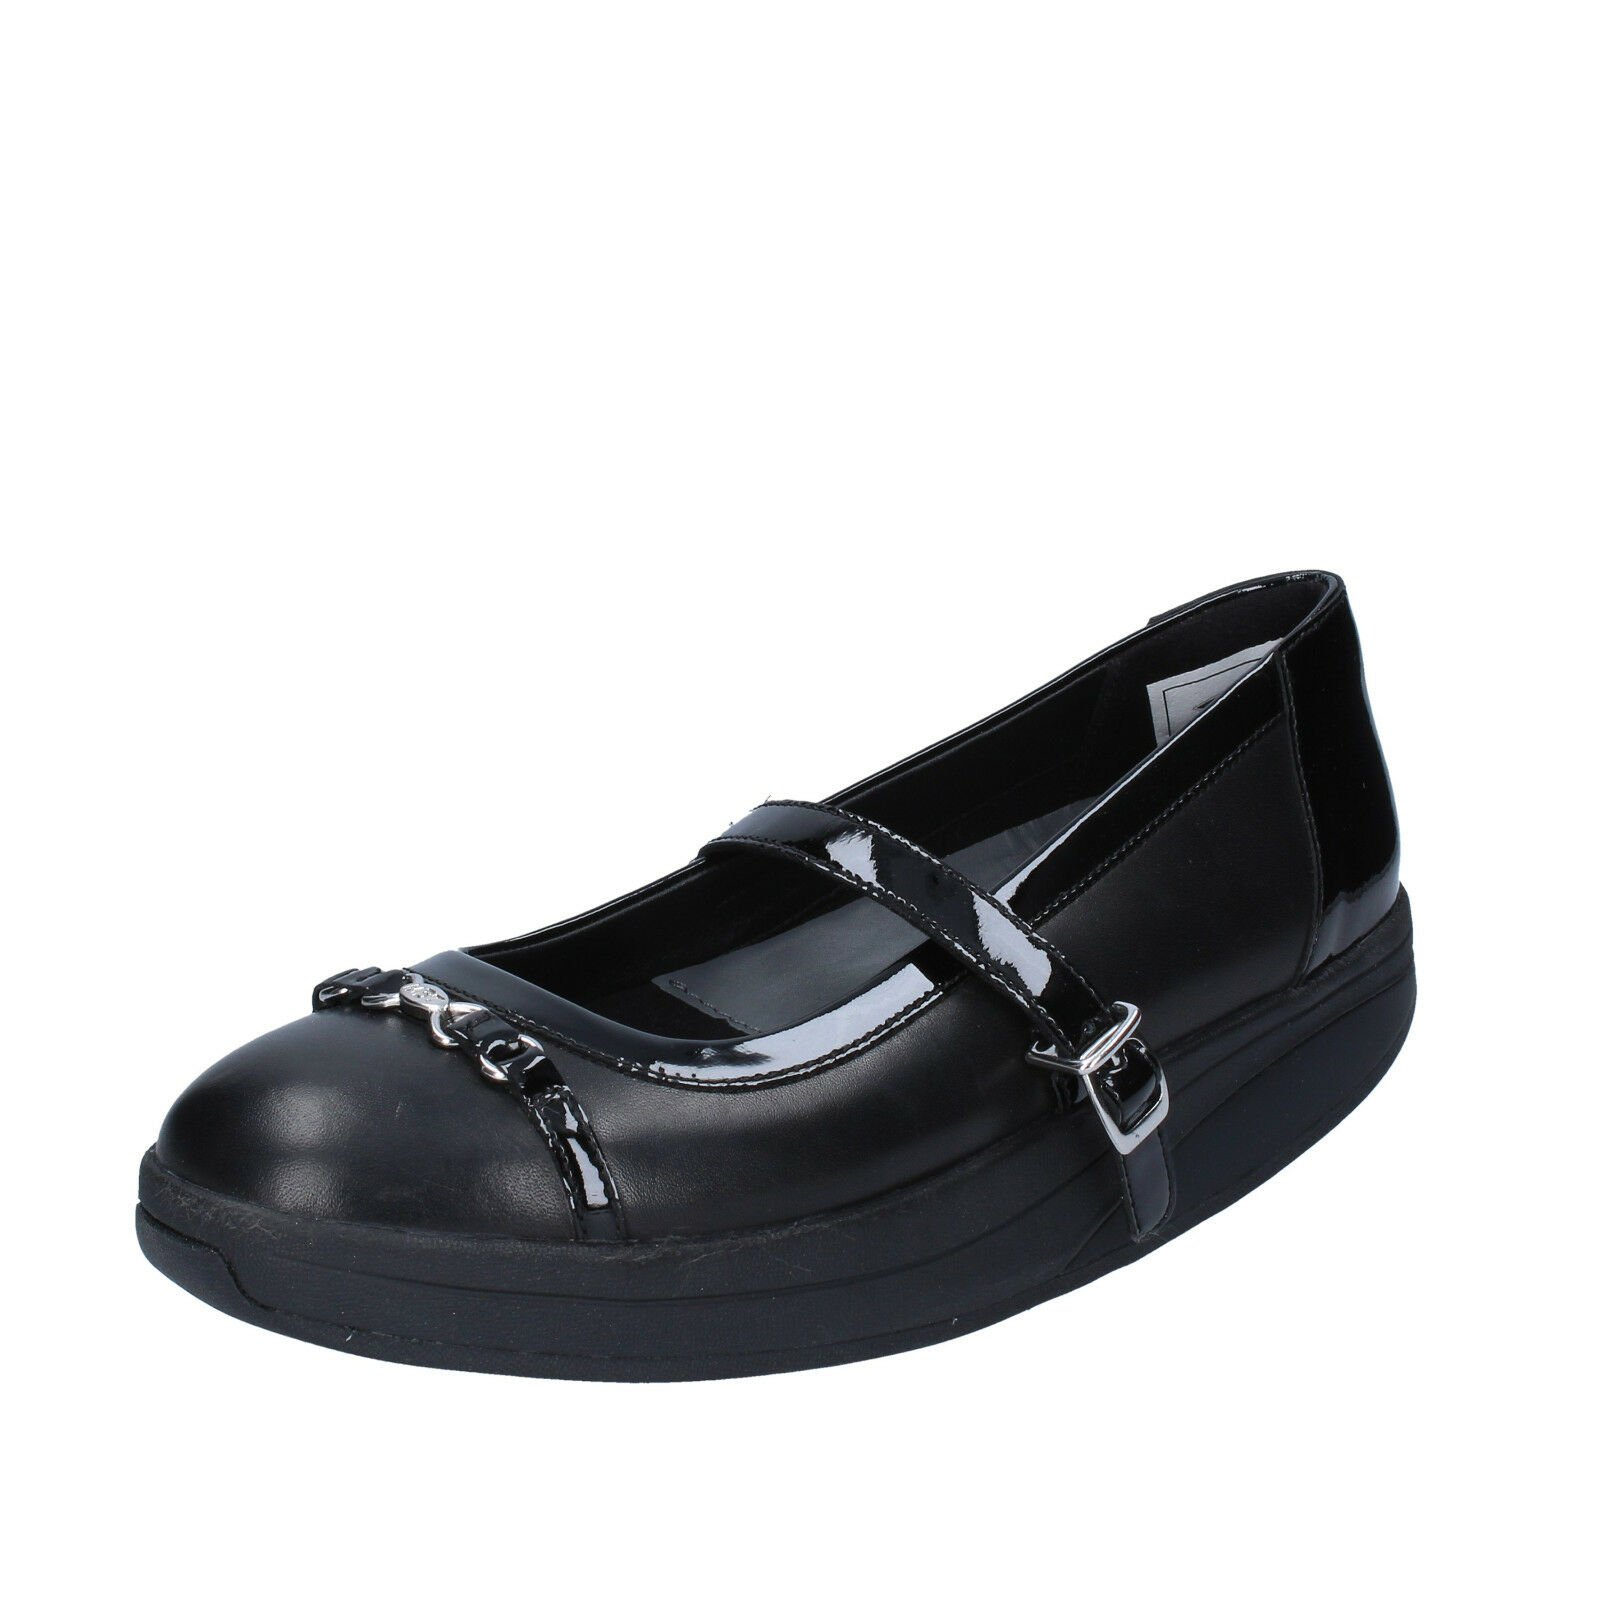 Scarpe donna MBT 37 EU ballerine nero pelle vernice BY966-37